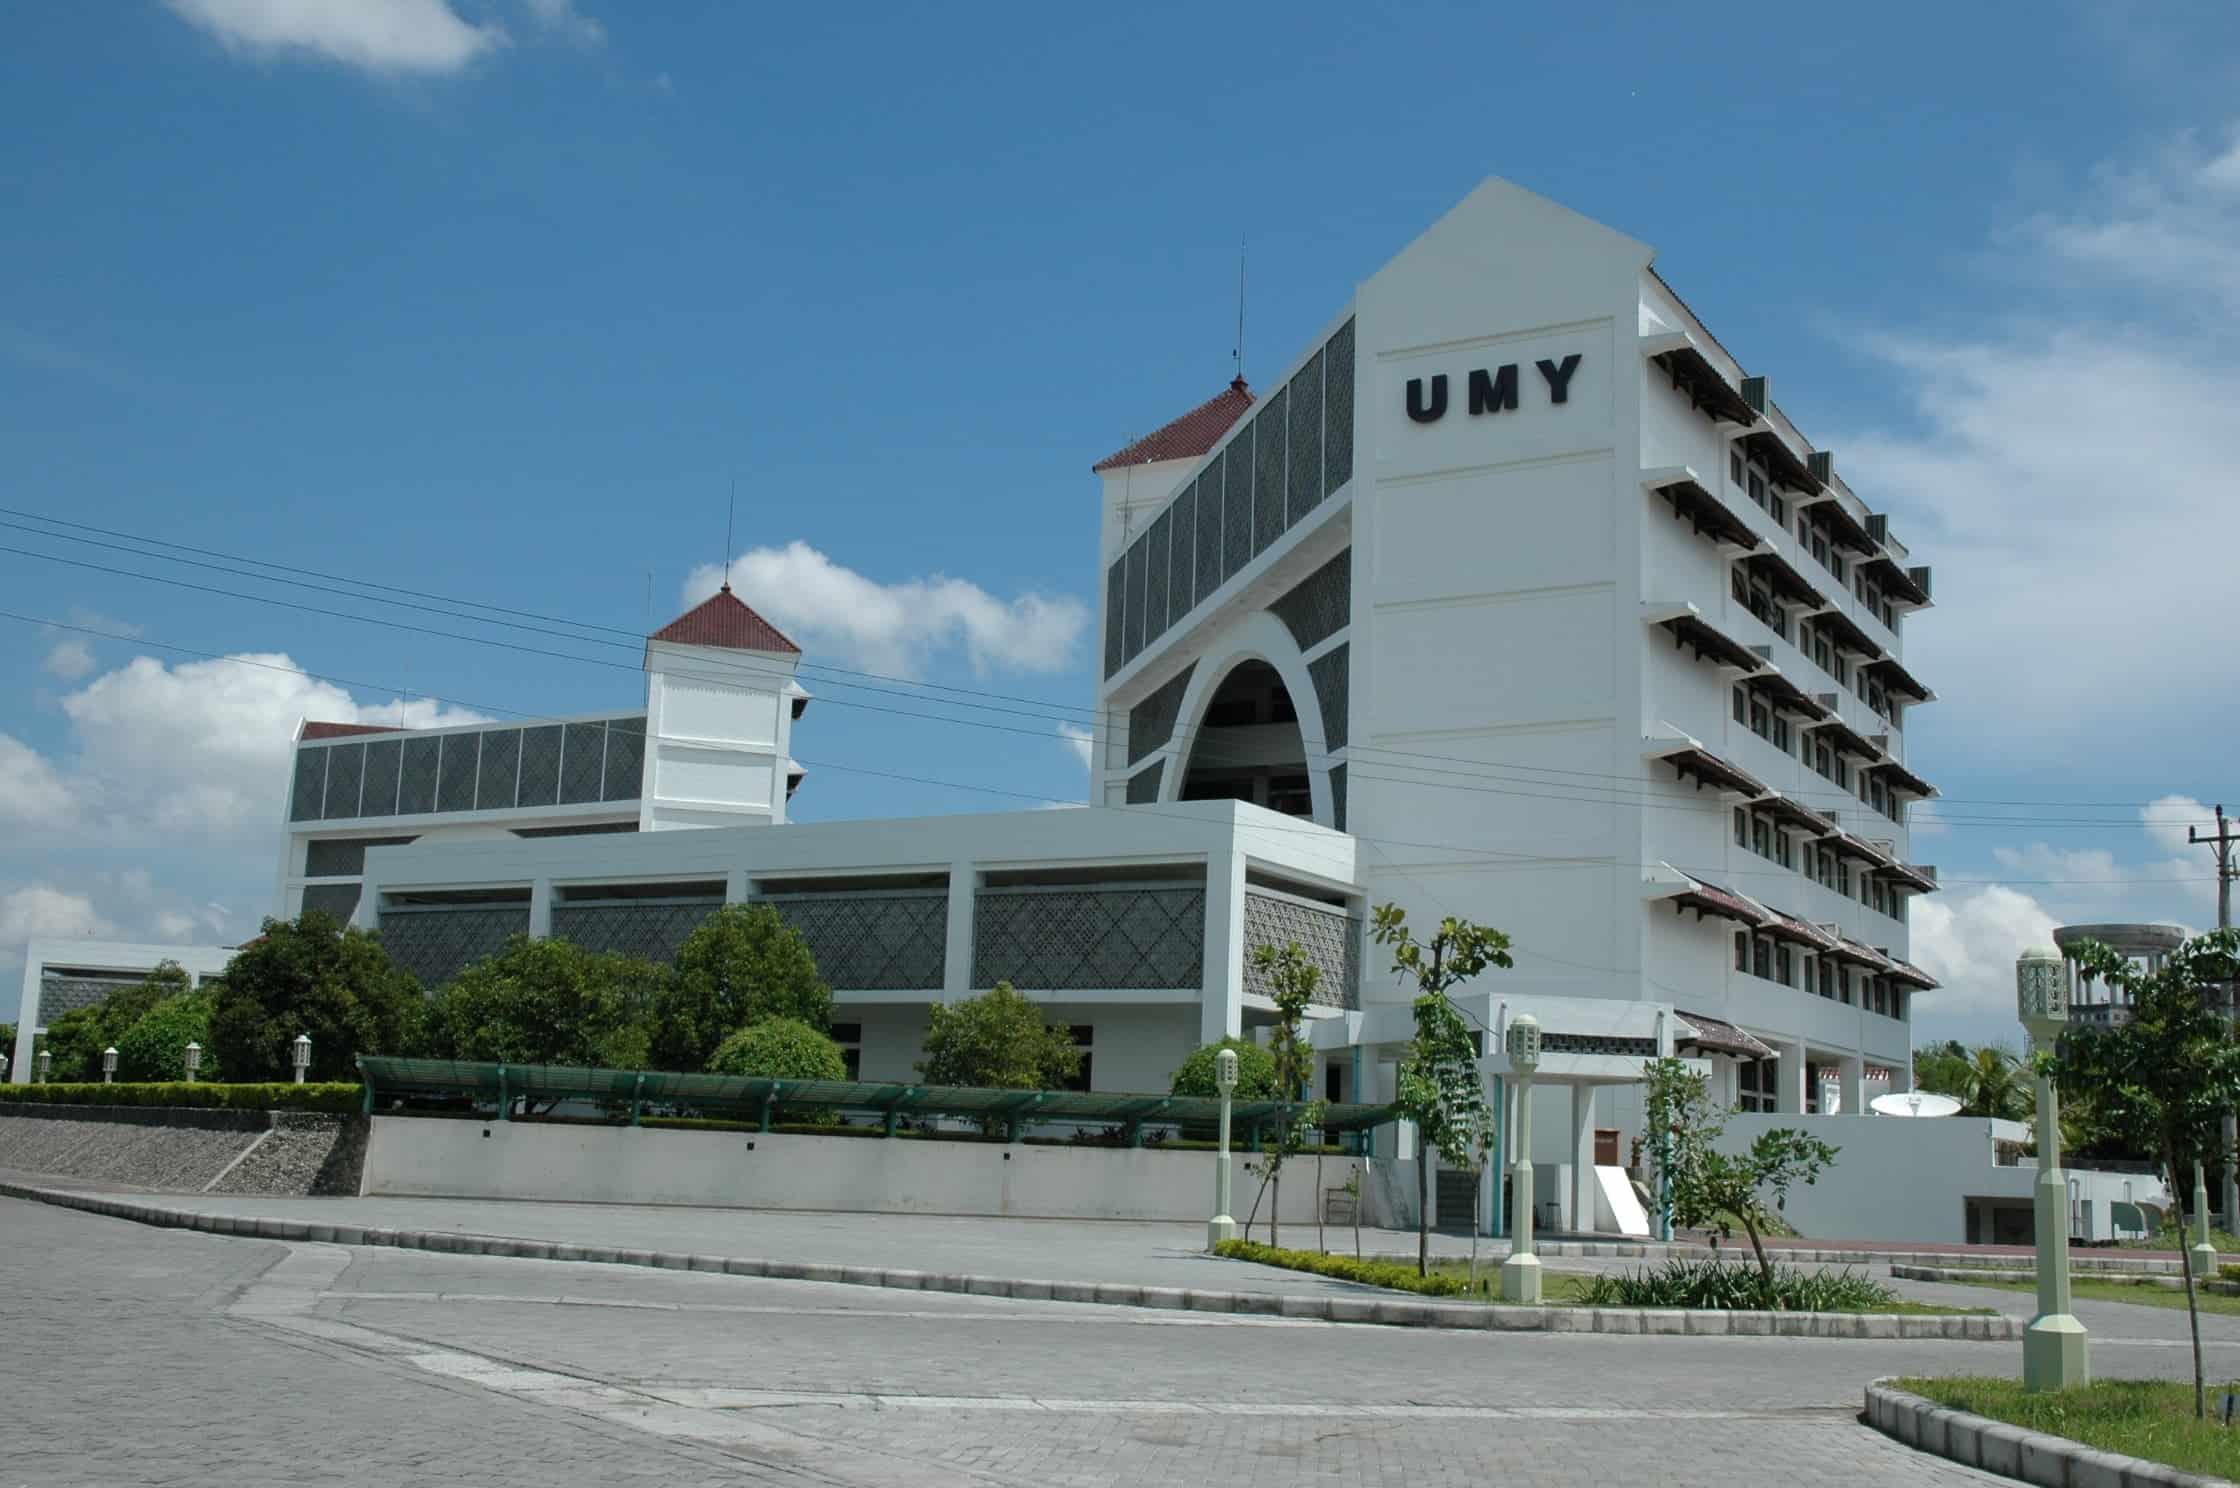 Universitas Muhammadiyah Yogyakarta (UMY)